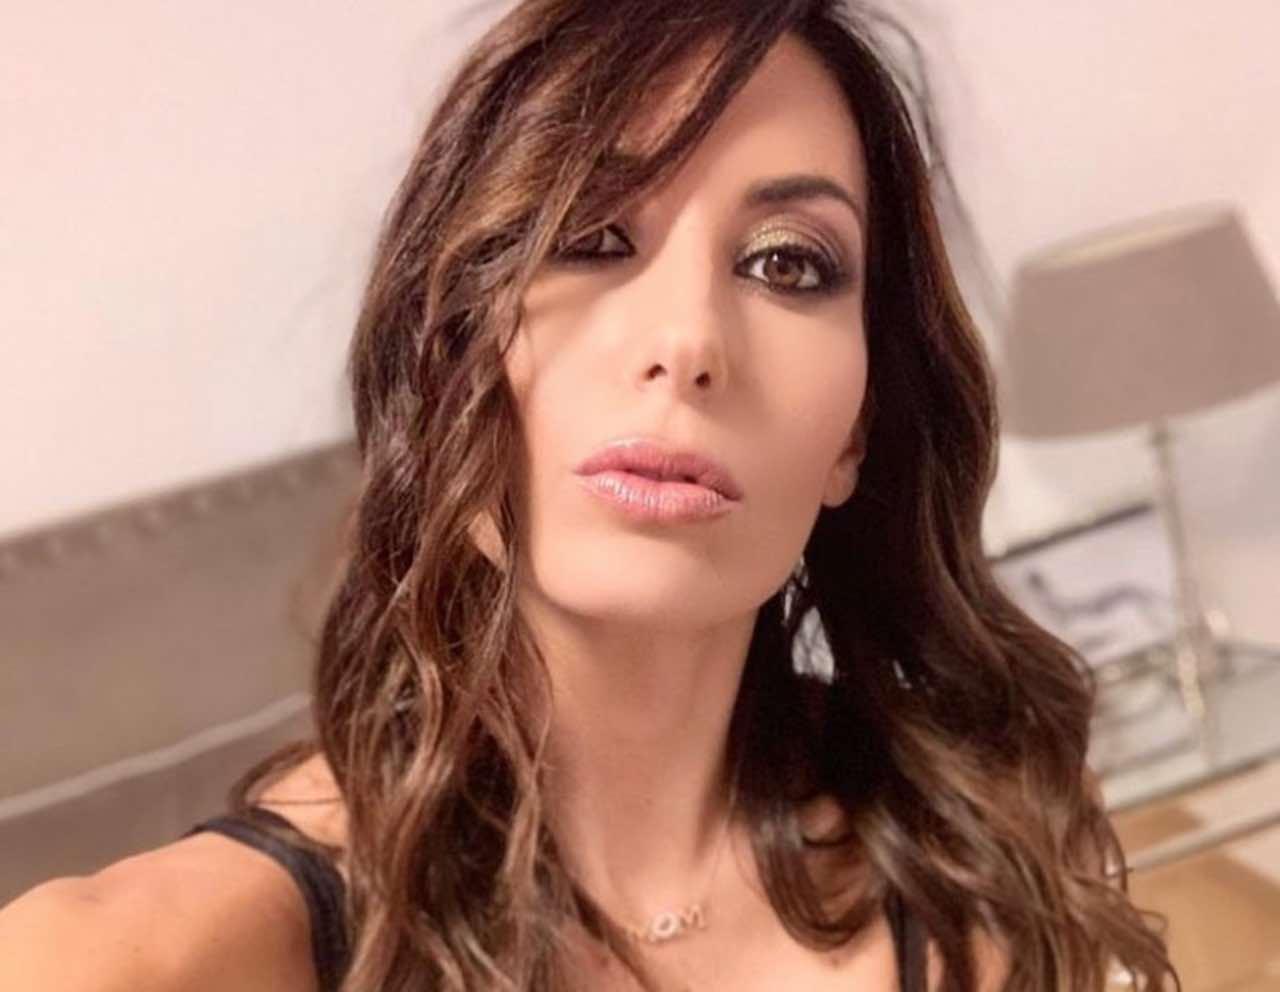 Elisabetta Gregoraci bellissima in bikini: Flavio Briatore si arrabbia